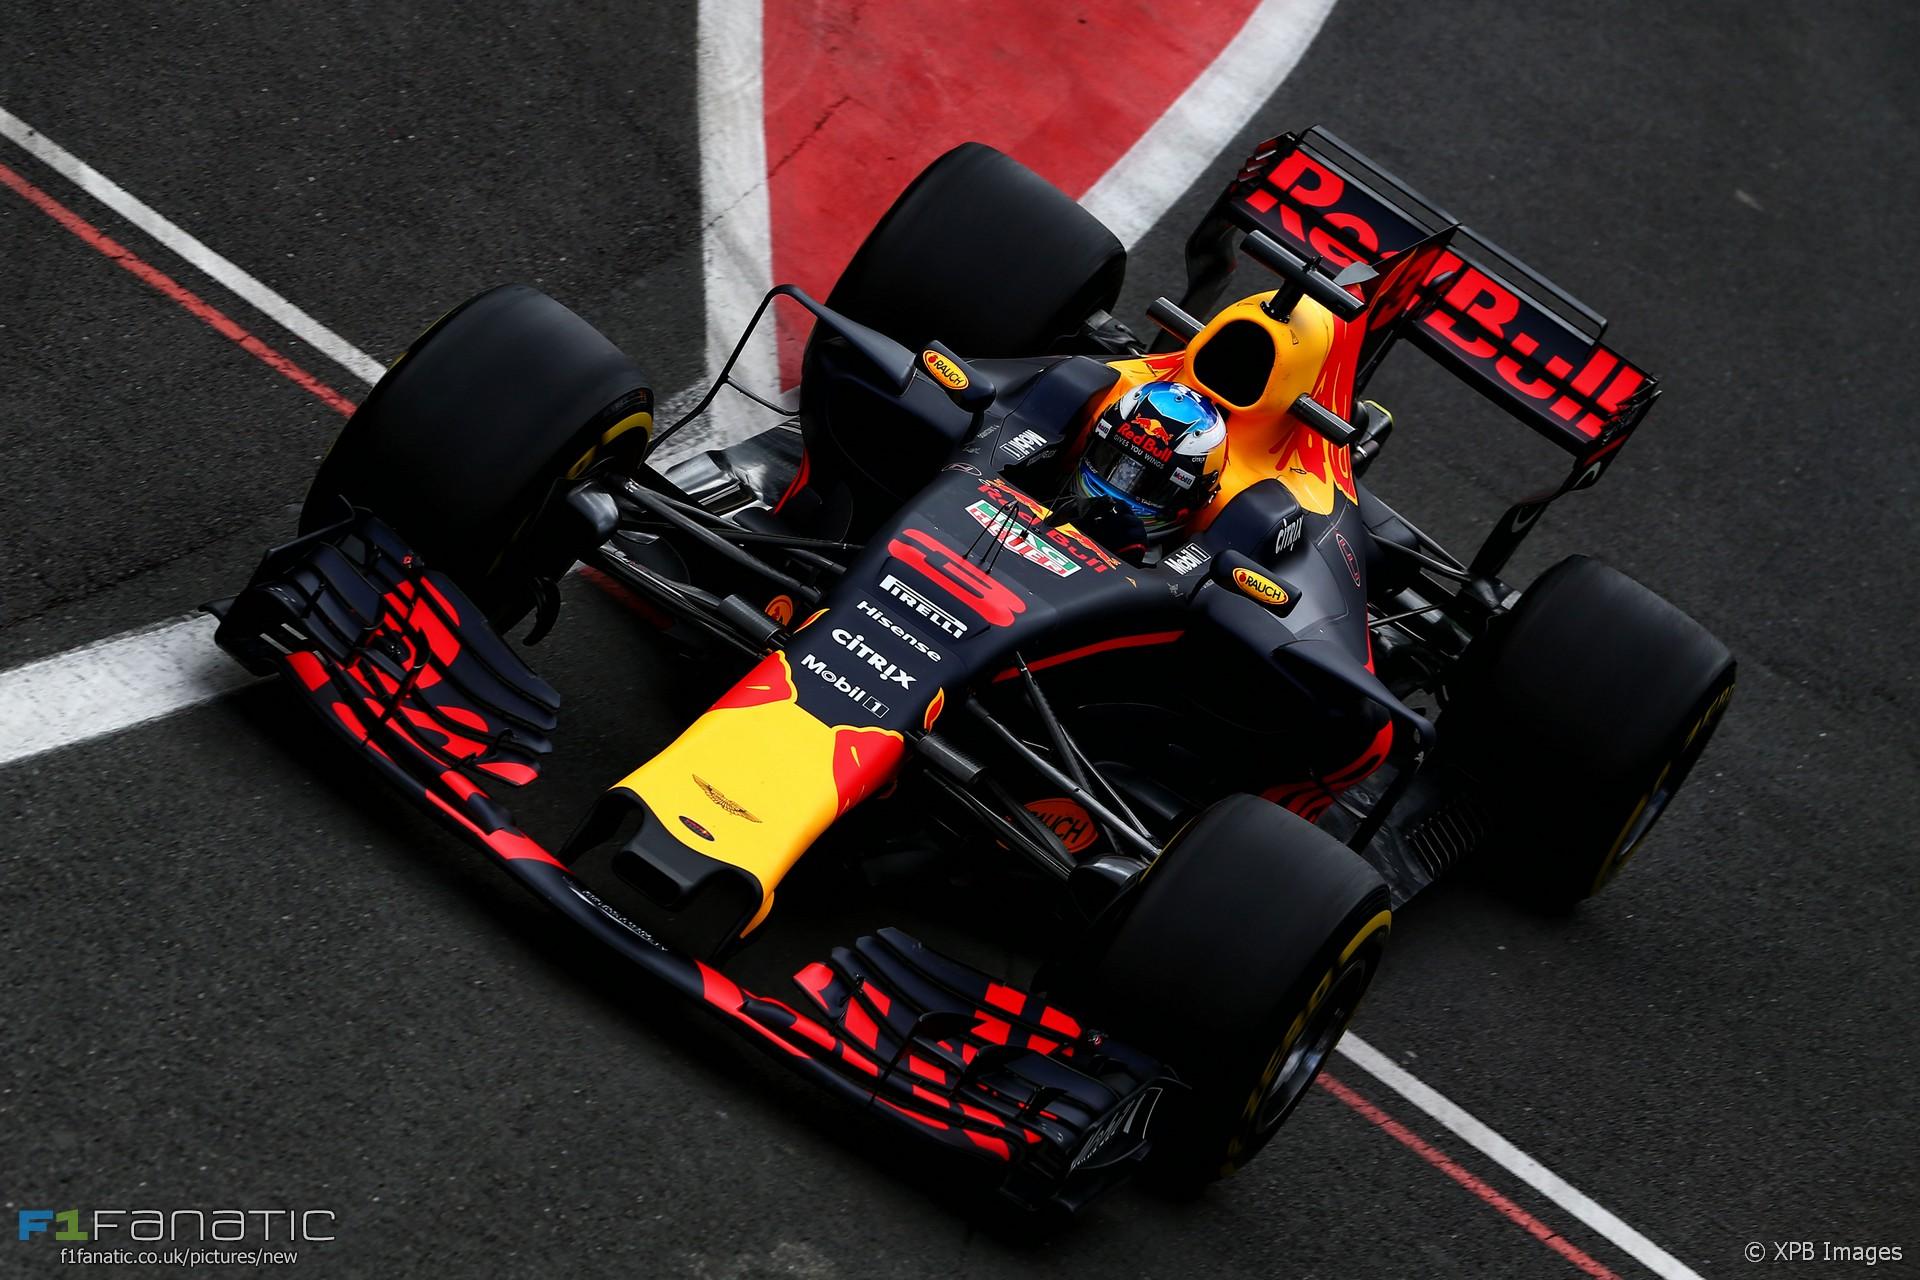 Daniel Ricciardo, Red Bull, Red Bull Ring, 2017